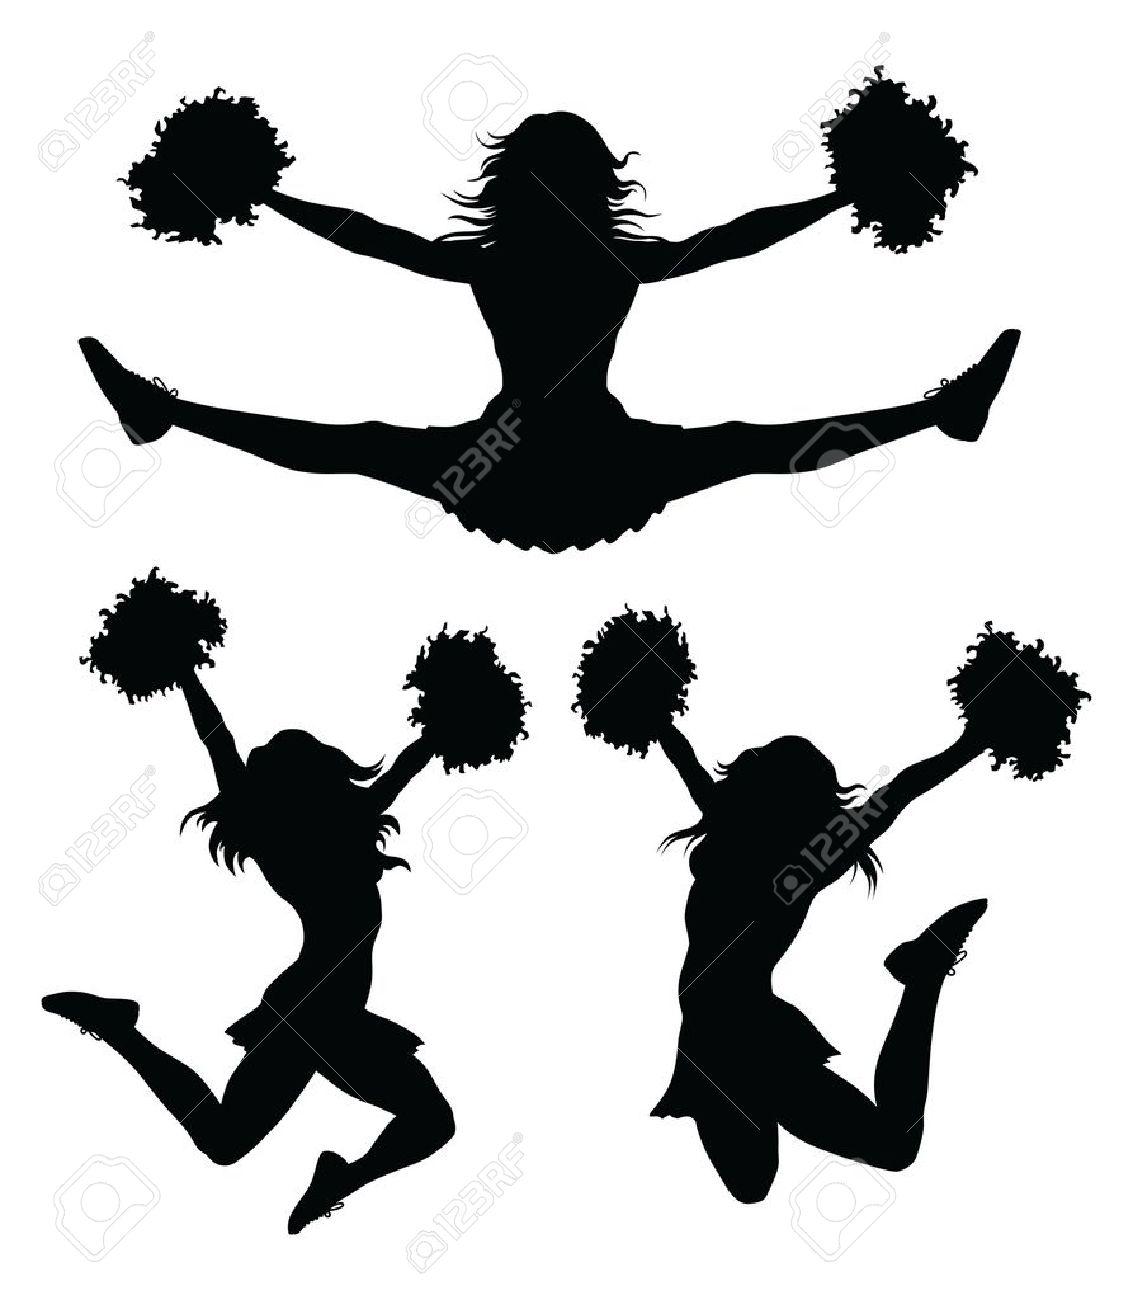 1133x1300 Cheer Jumps Silhouette Clipart